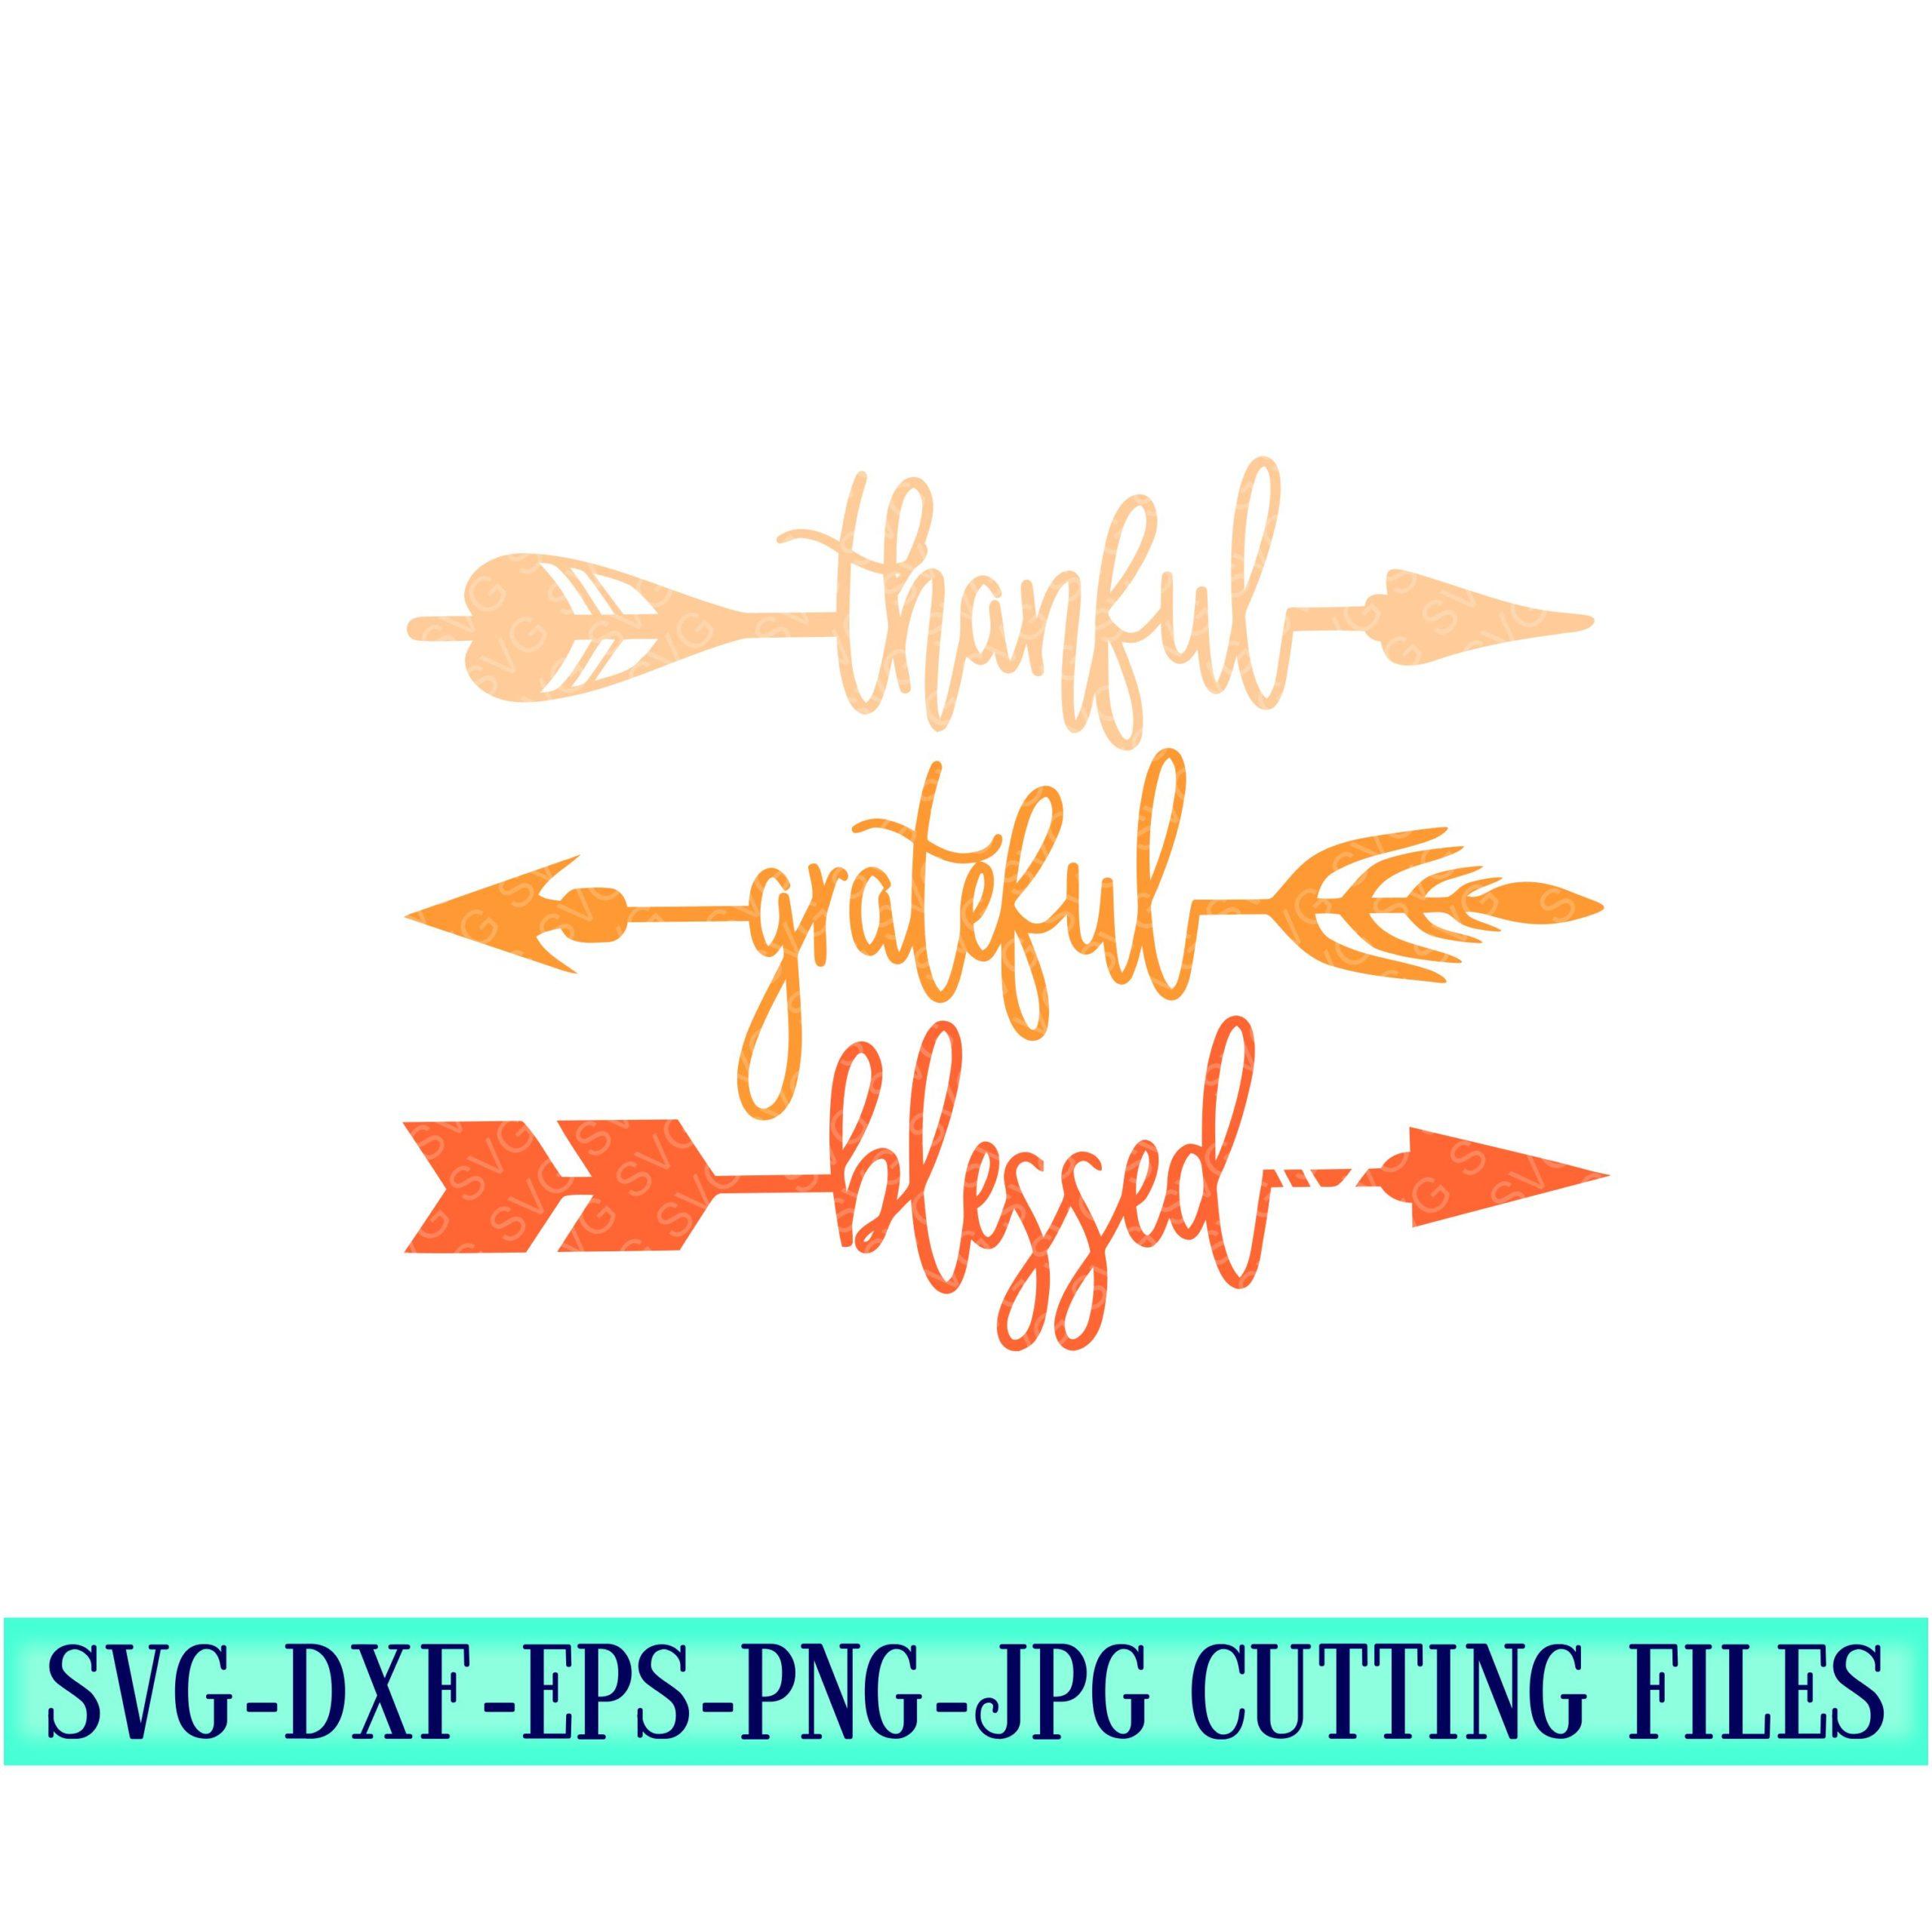 Thankfulgratefulblessedarrowsvg-j82mbn